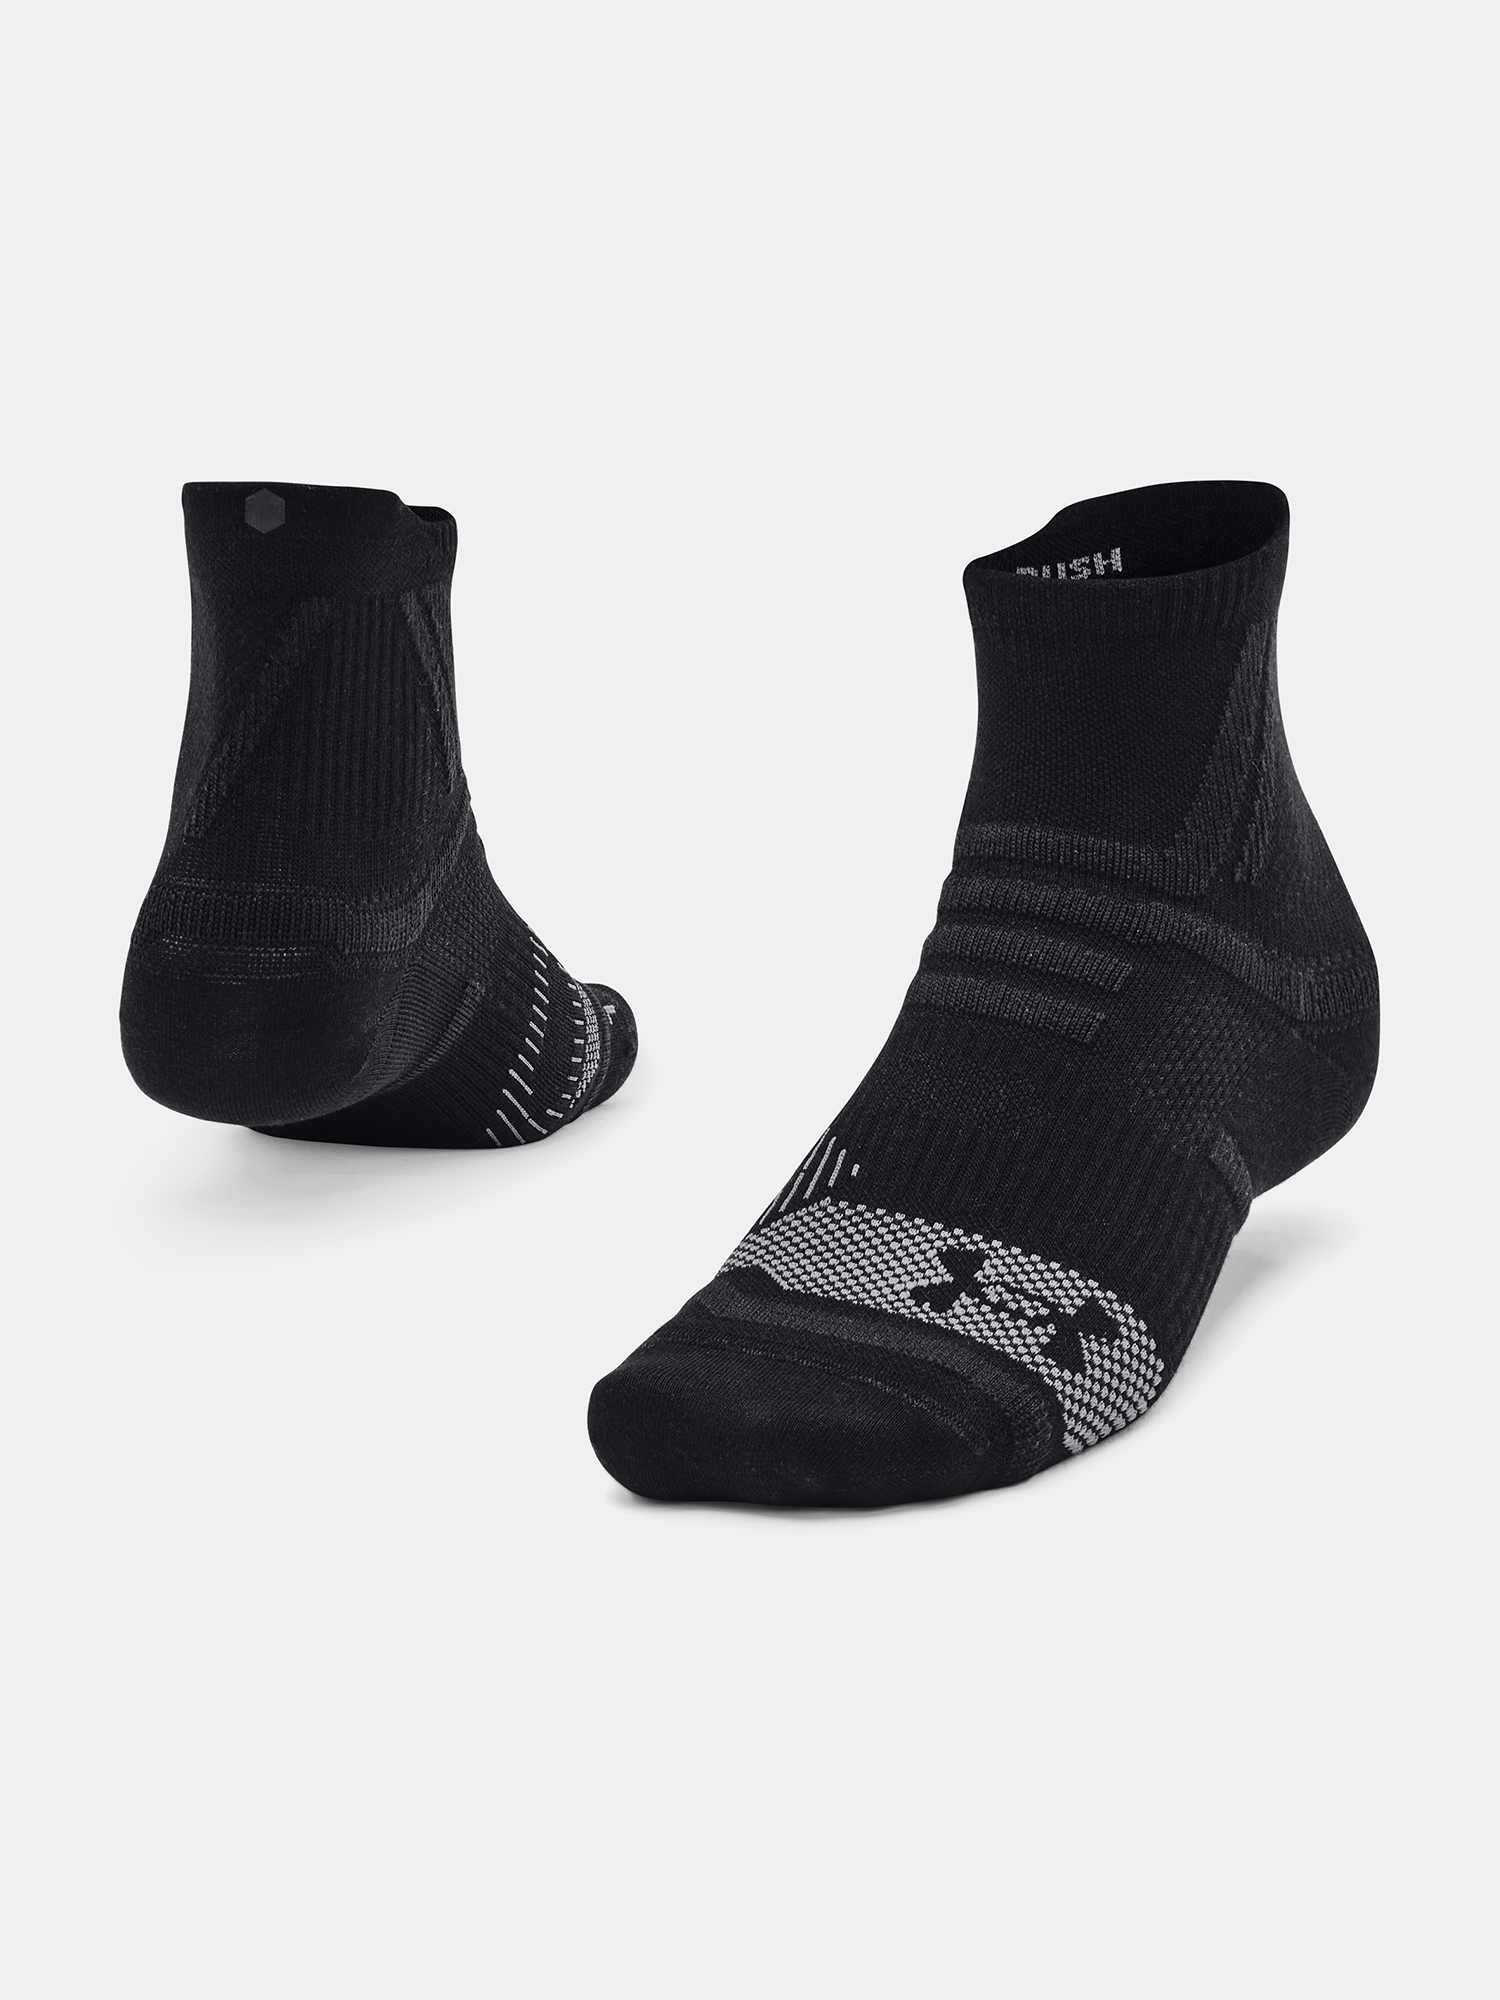 Under Armour RUSH™ Ponožky Čierna - 40 1/2-44 1/2